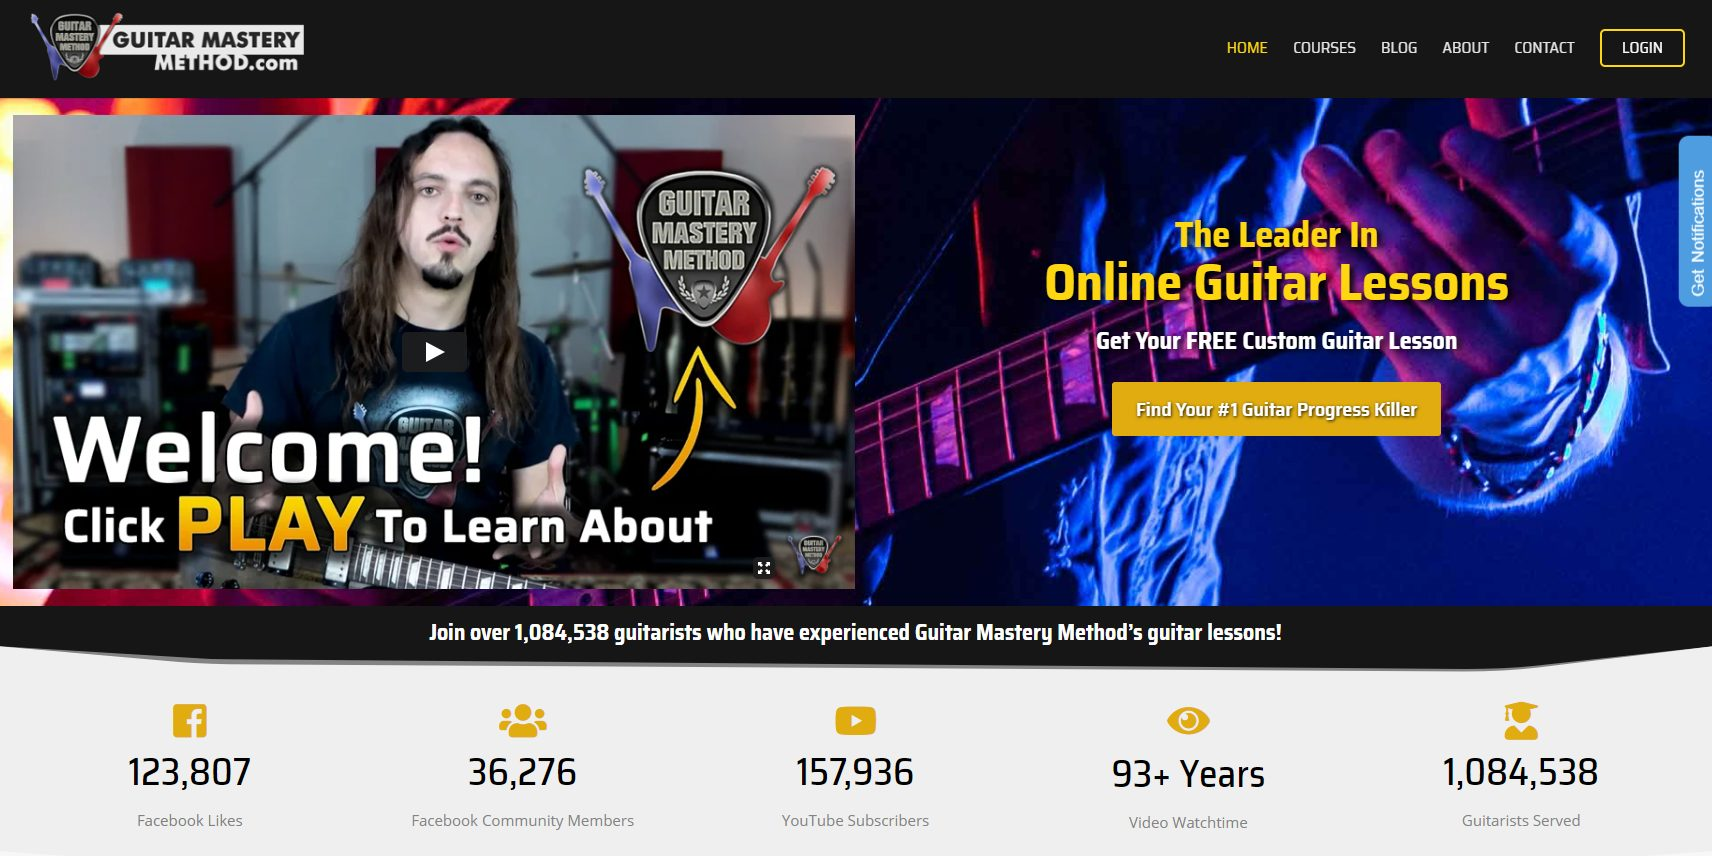 Guitar Mastery Method Home Page - January 2021